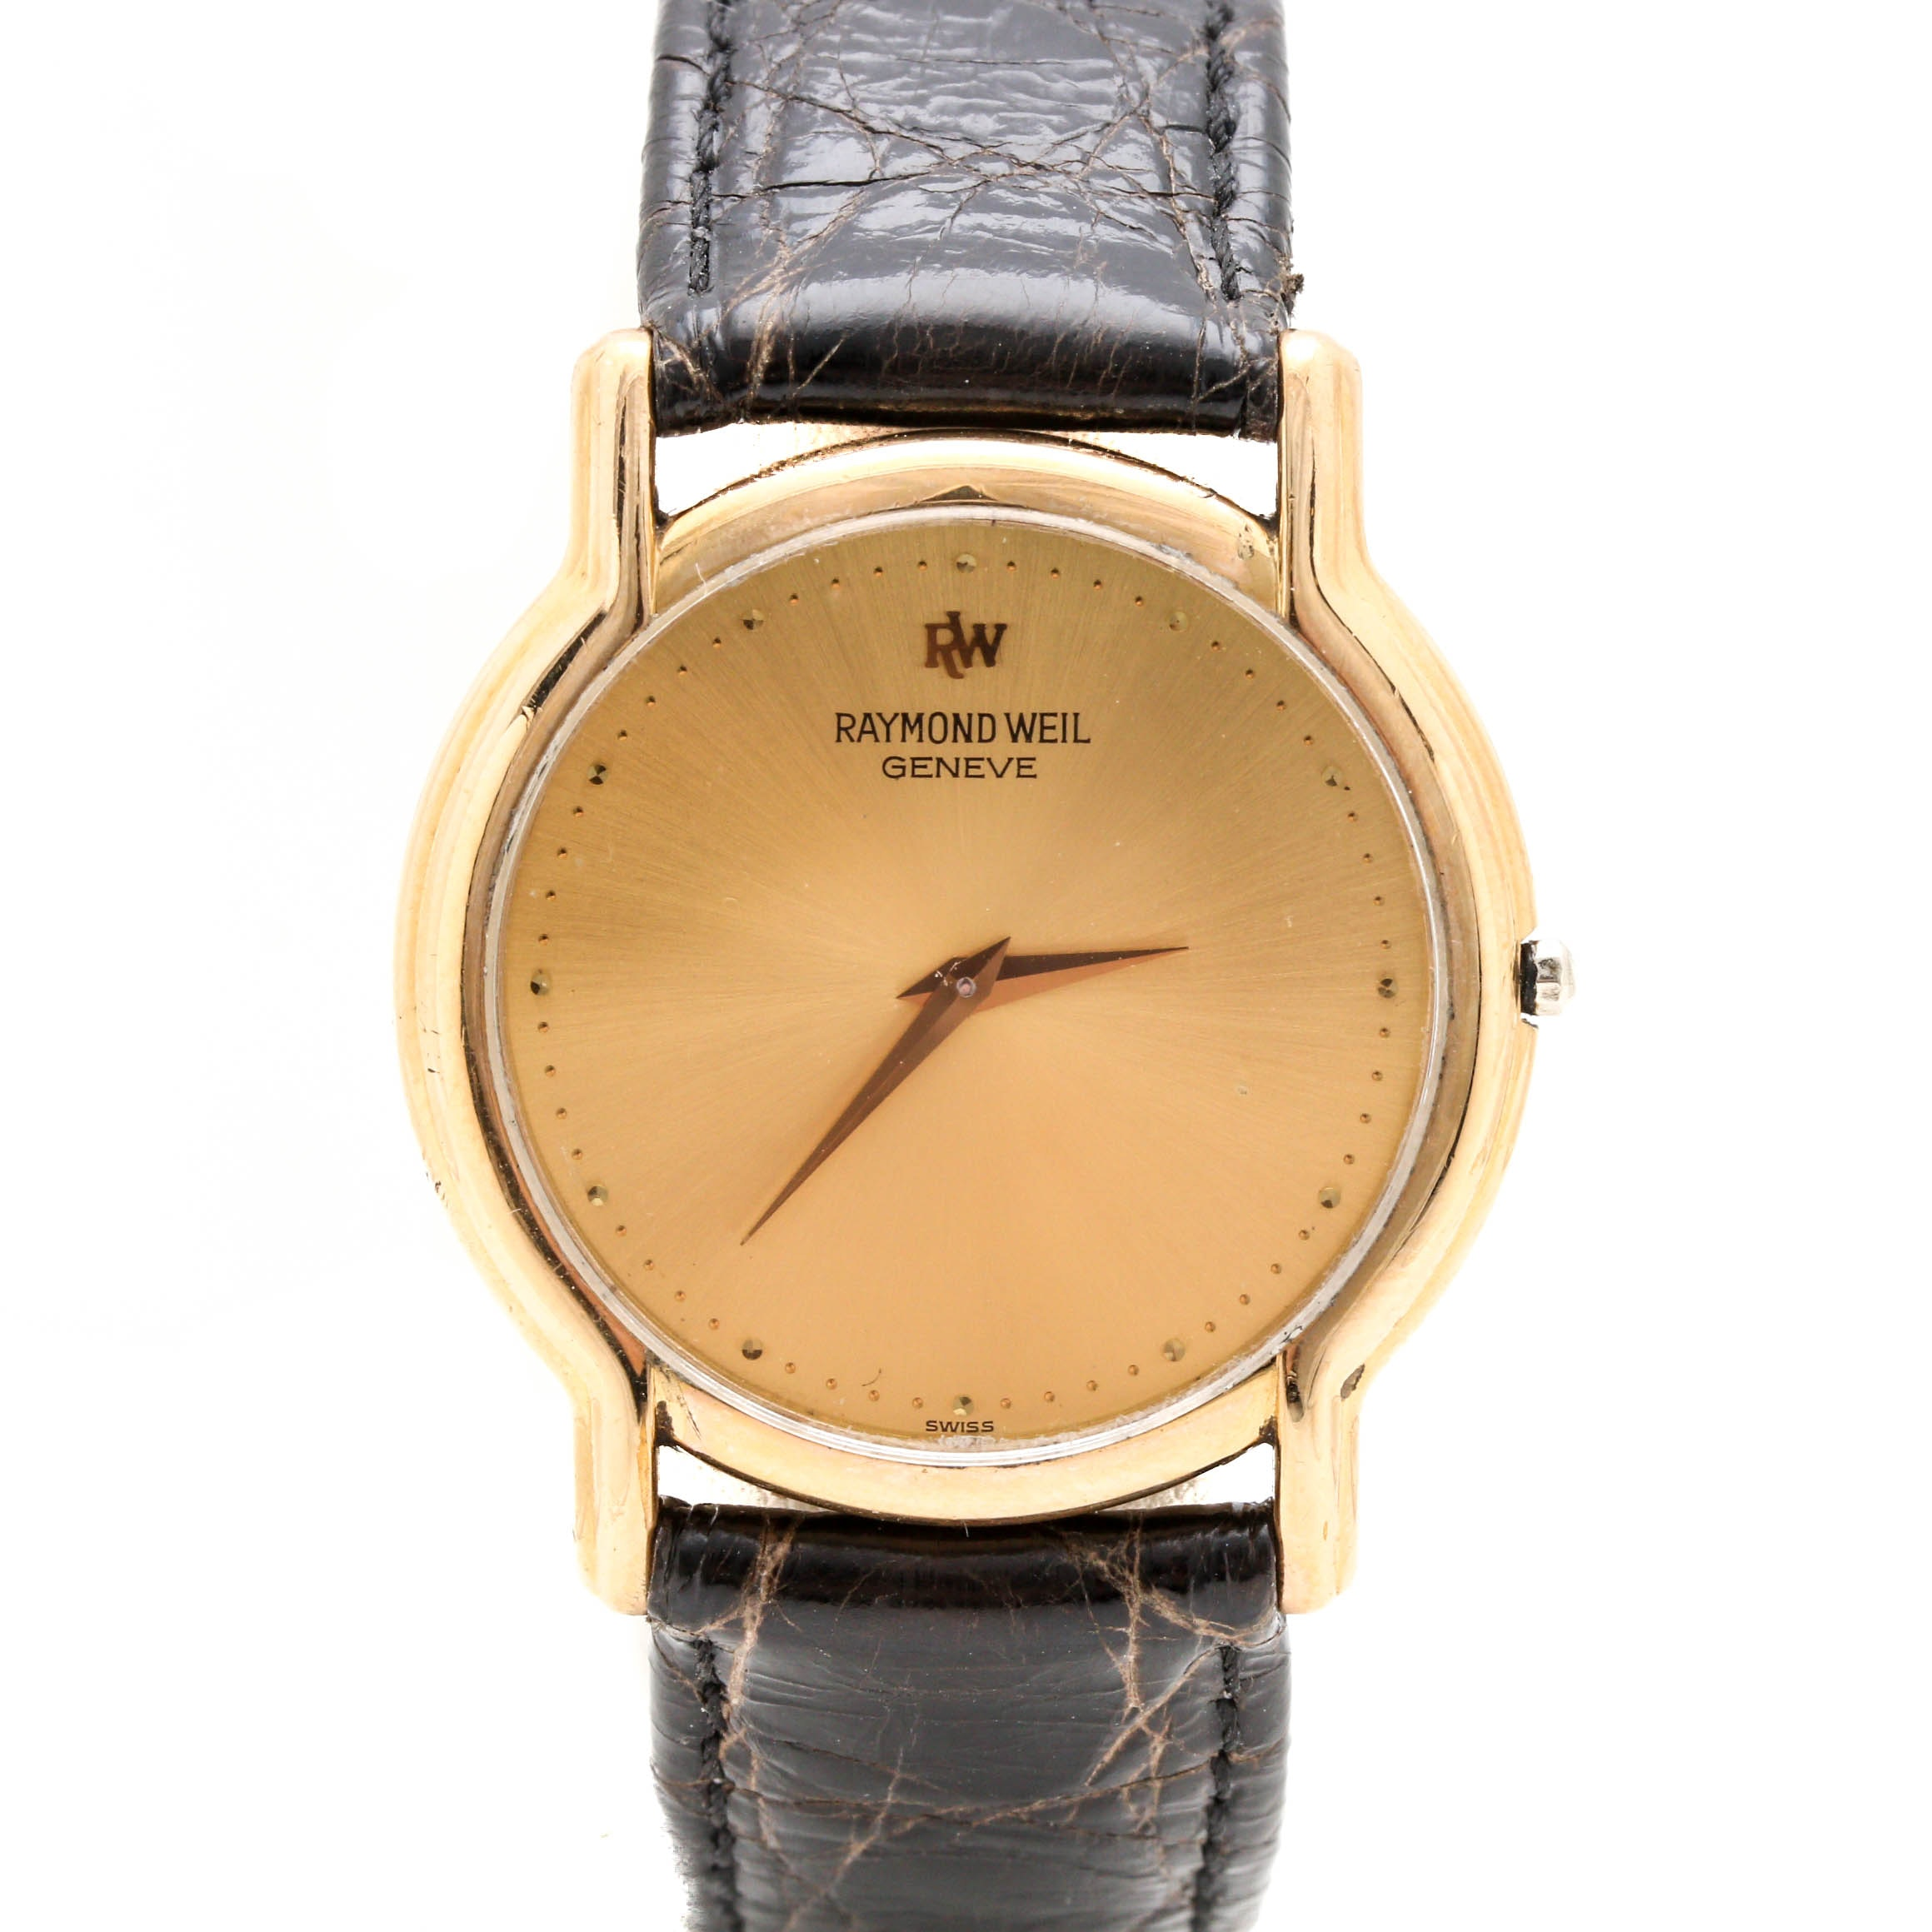 Raymond Weil 18K Gold Plate Wristwatch